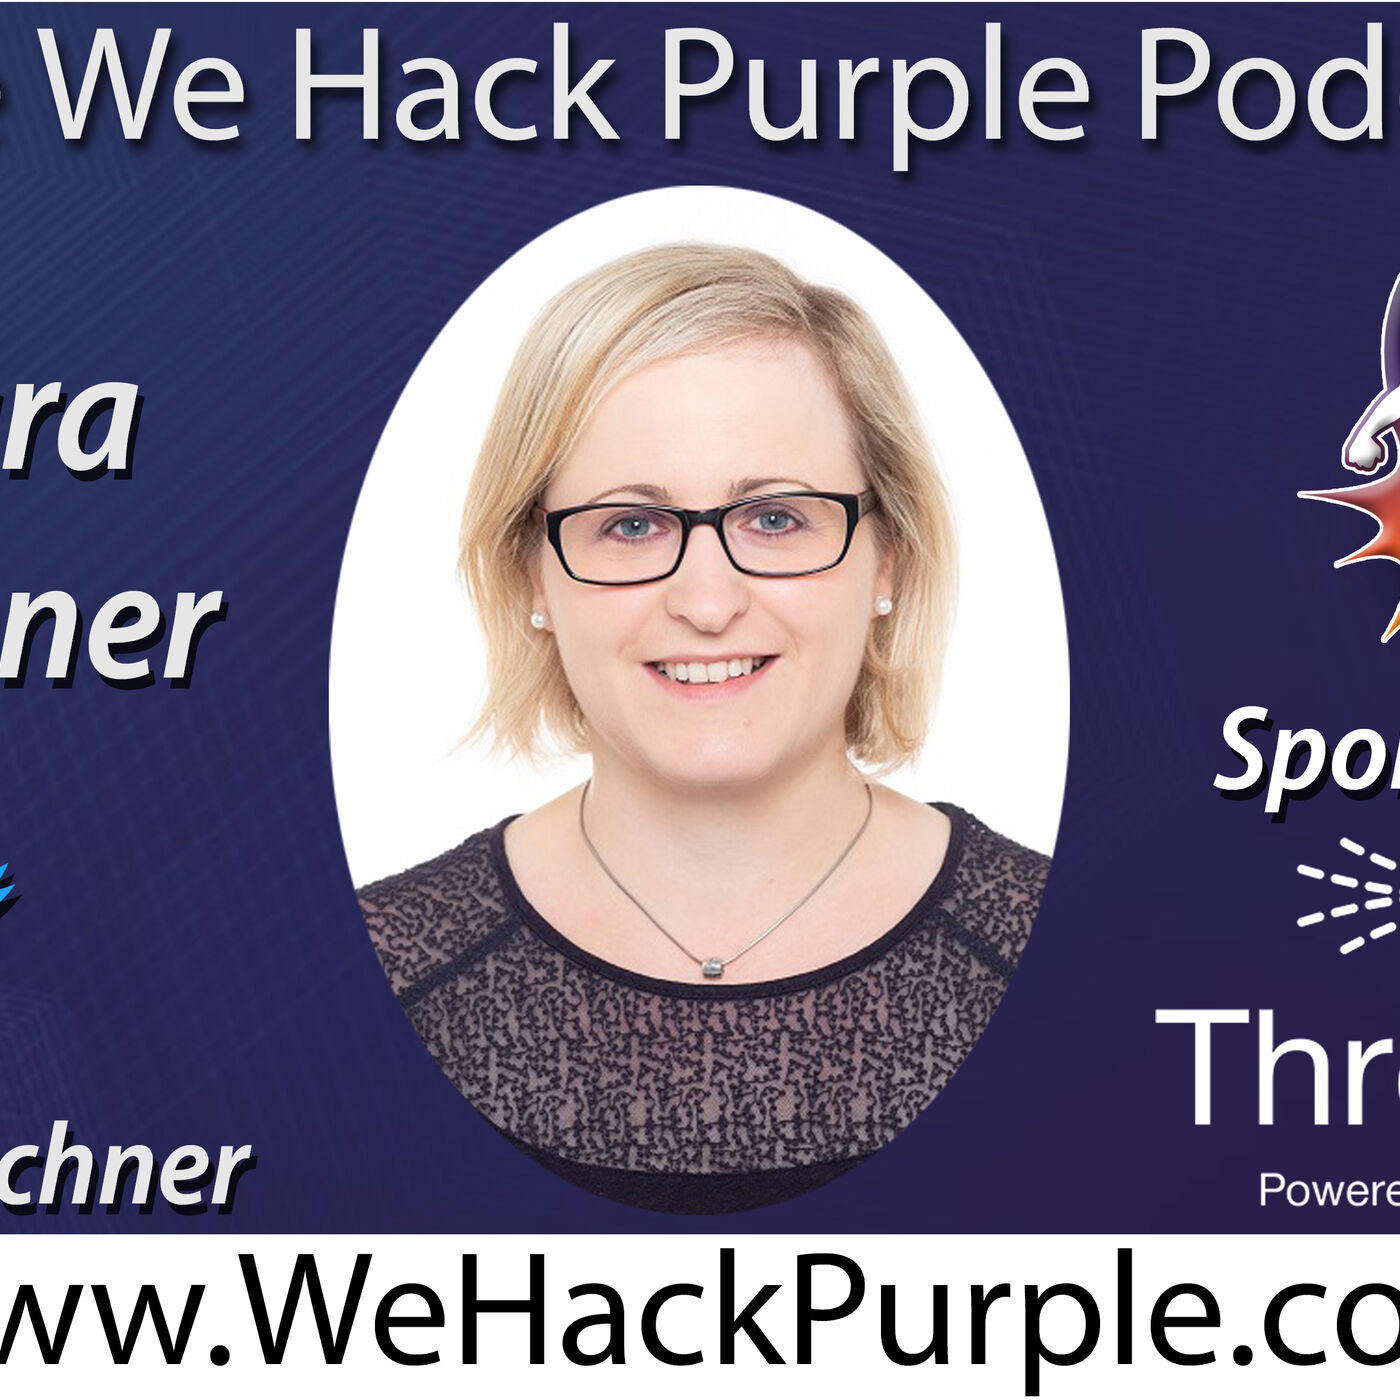 We Hack Purple Podcast 26 with Barbara Schachner